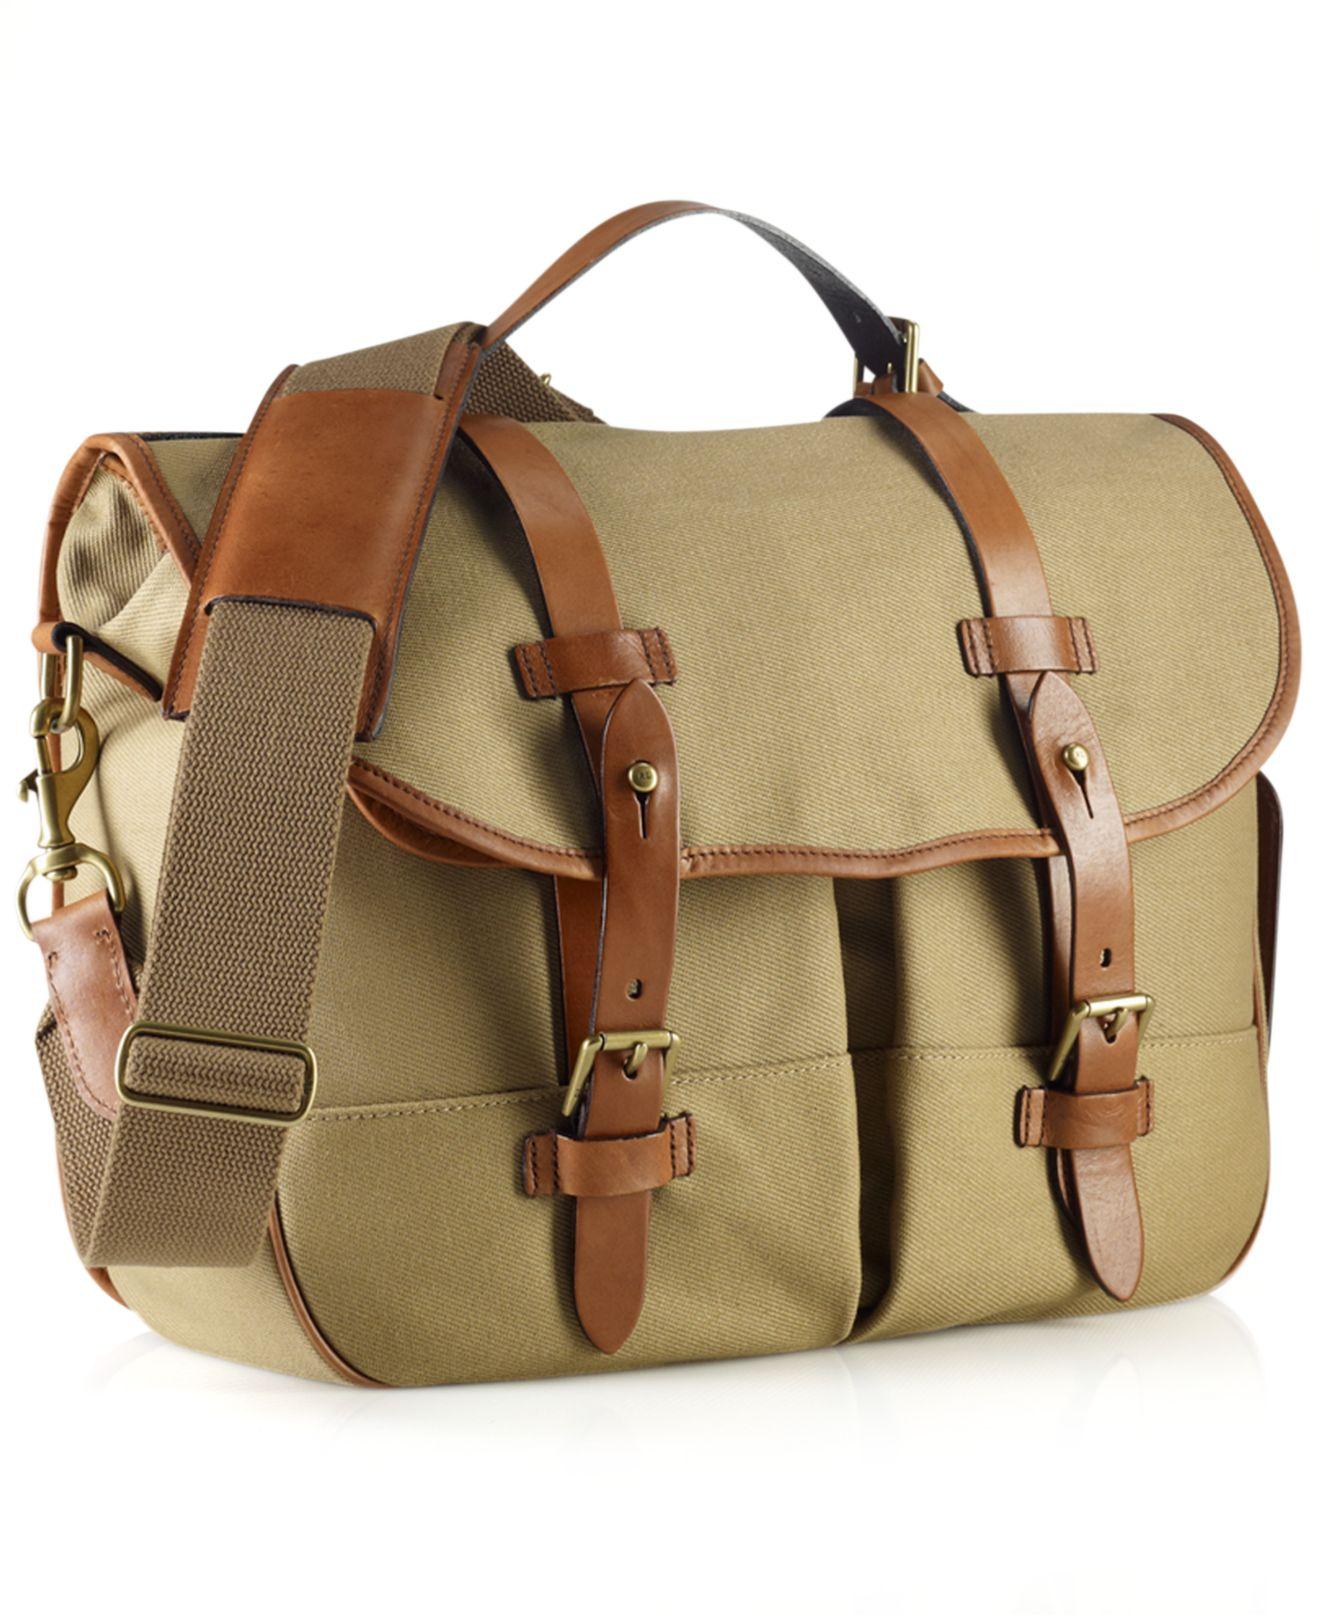 Lyst - Polo Ralph Lauren Core Canvas Messenger Bag in Natural for Men 2cf27dc697e4b